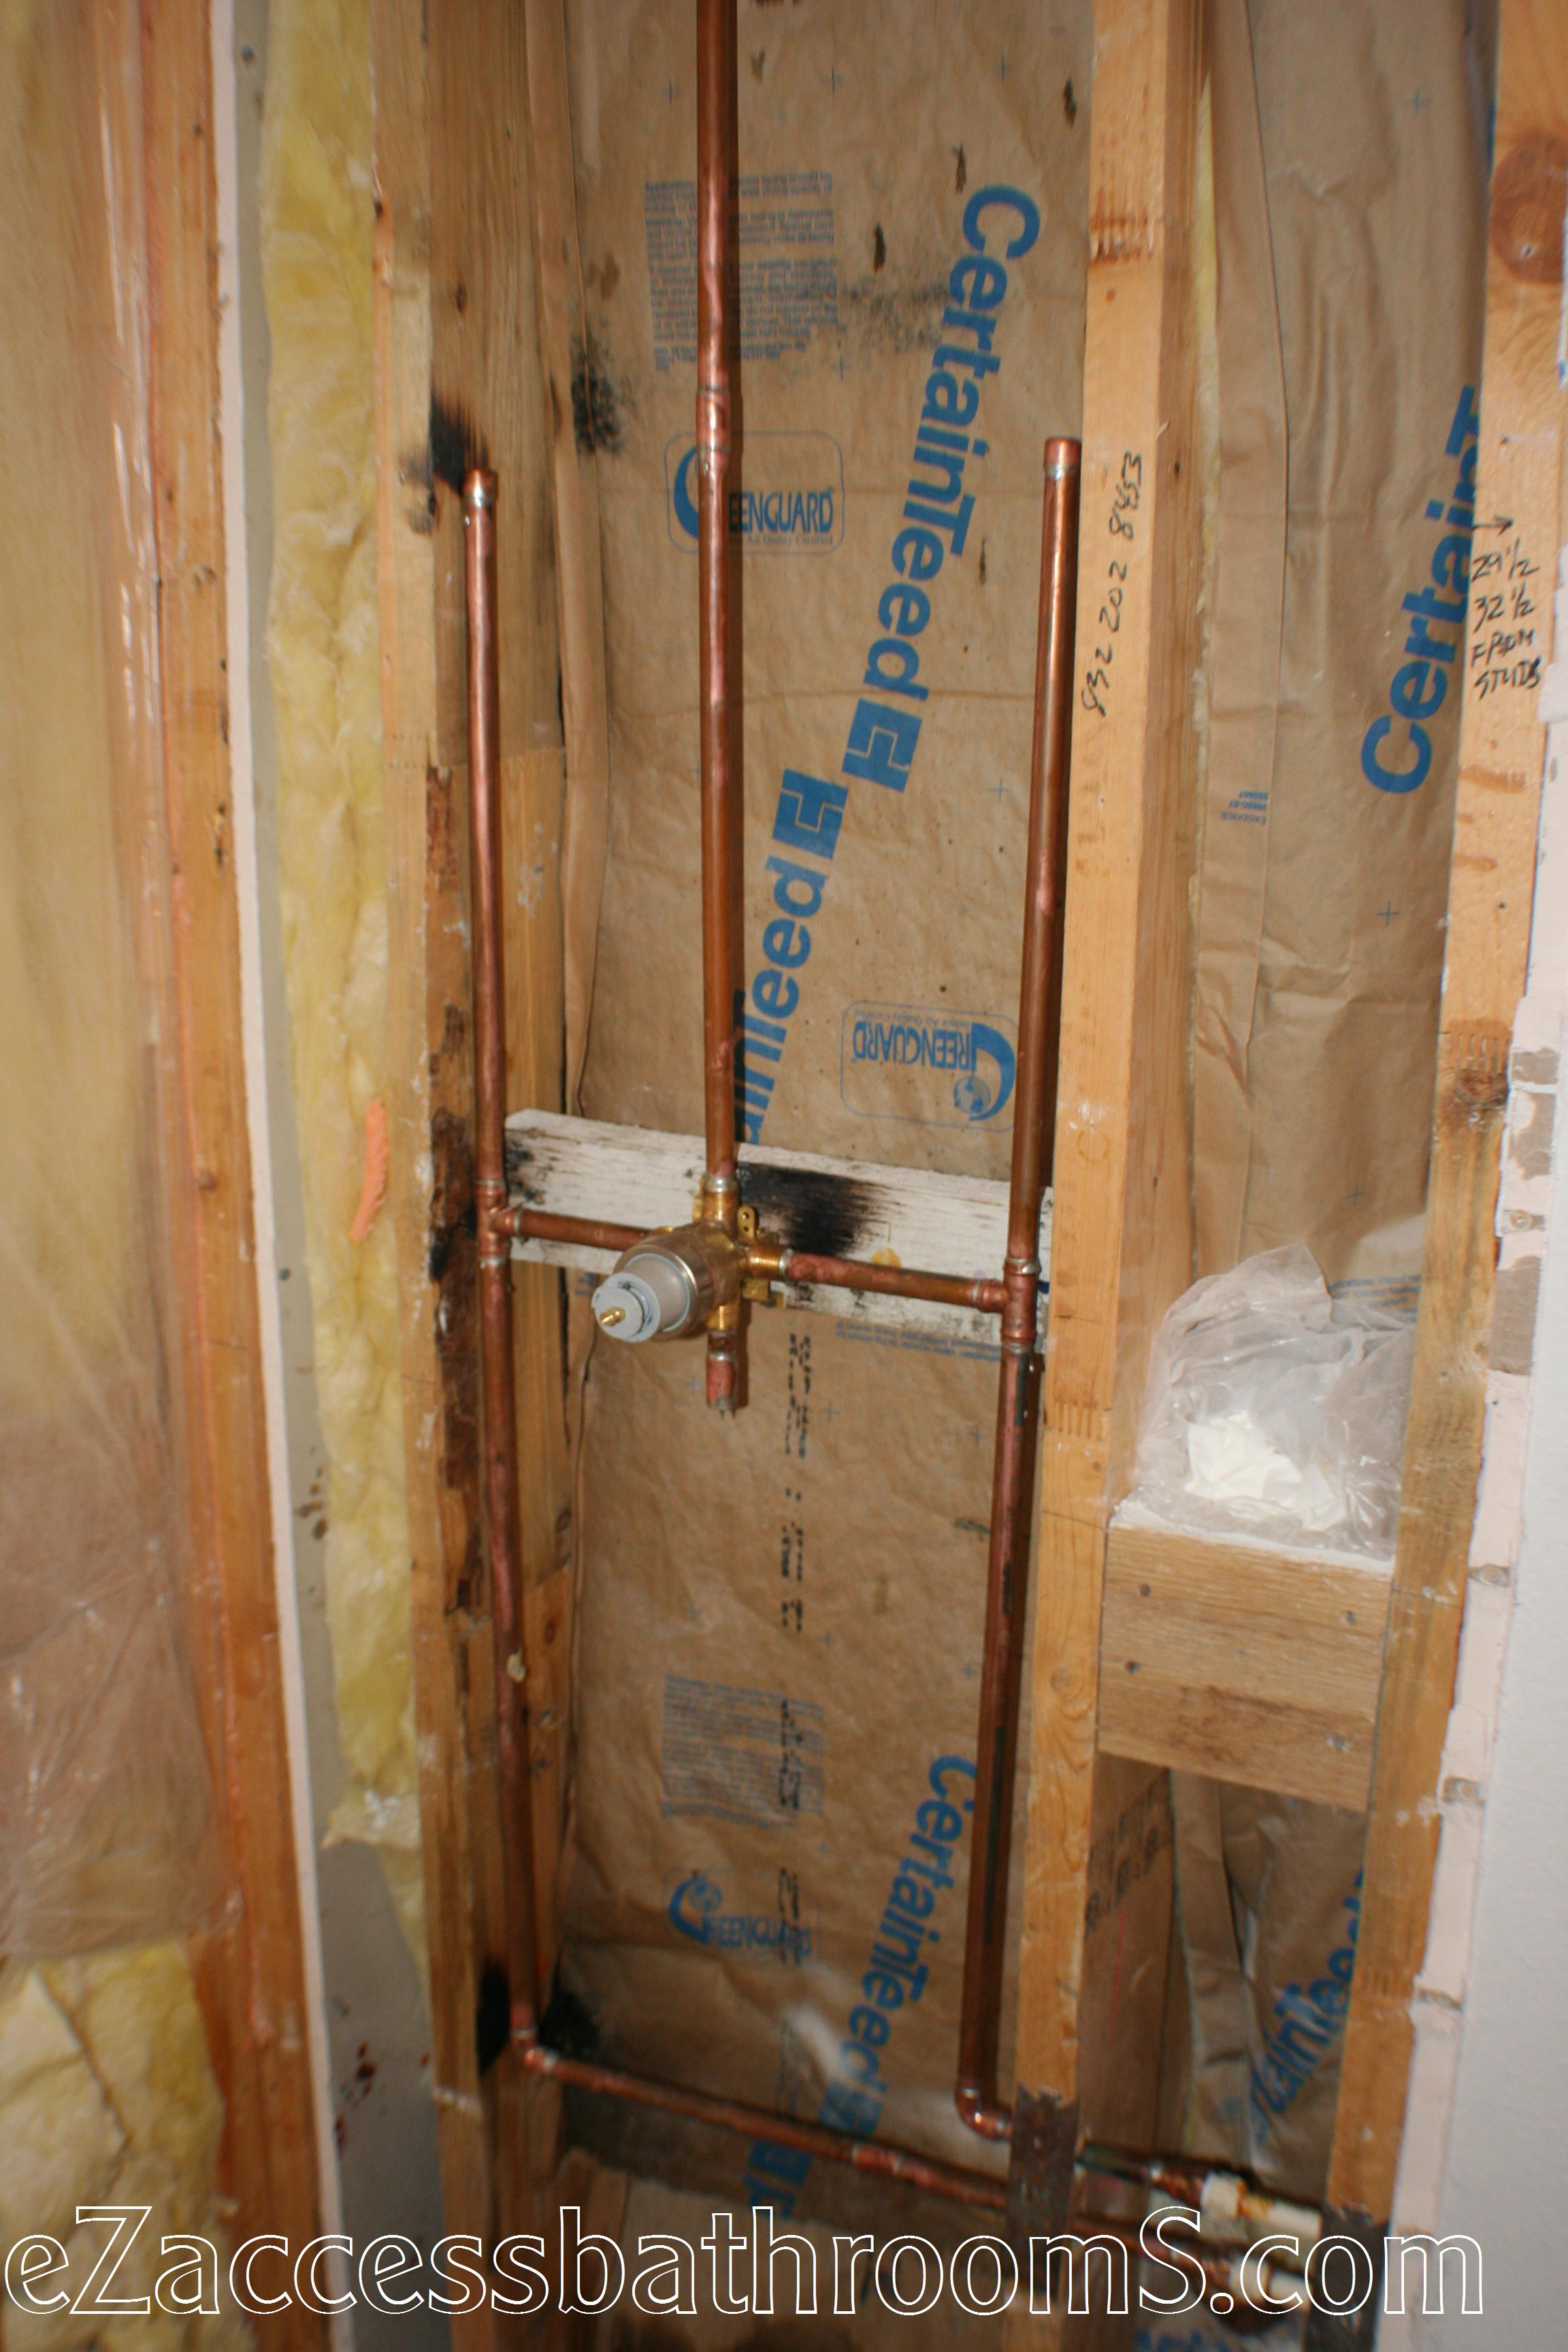 cheap tub to shower conversion ezaccessbathrooms.com 019.JPG